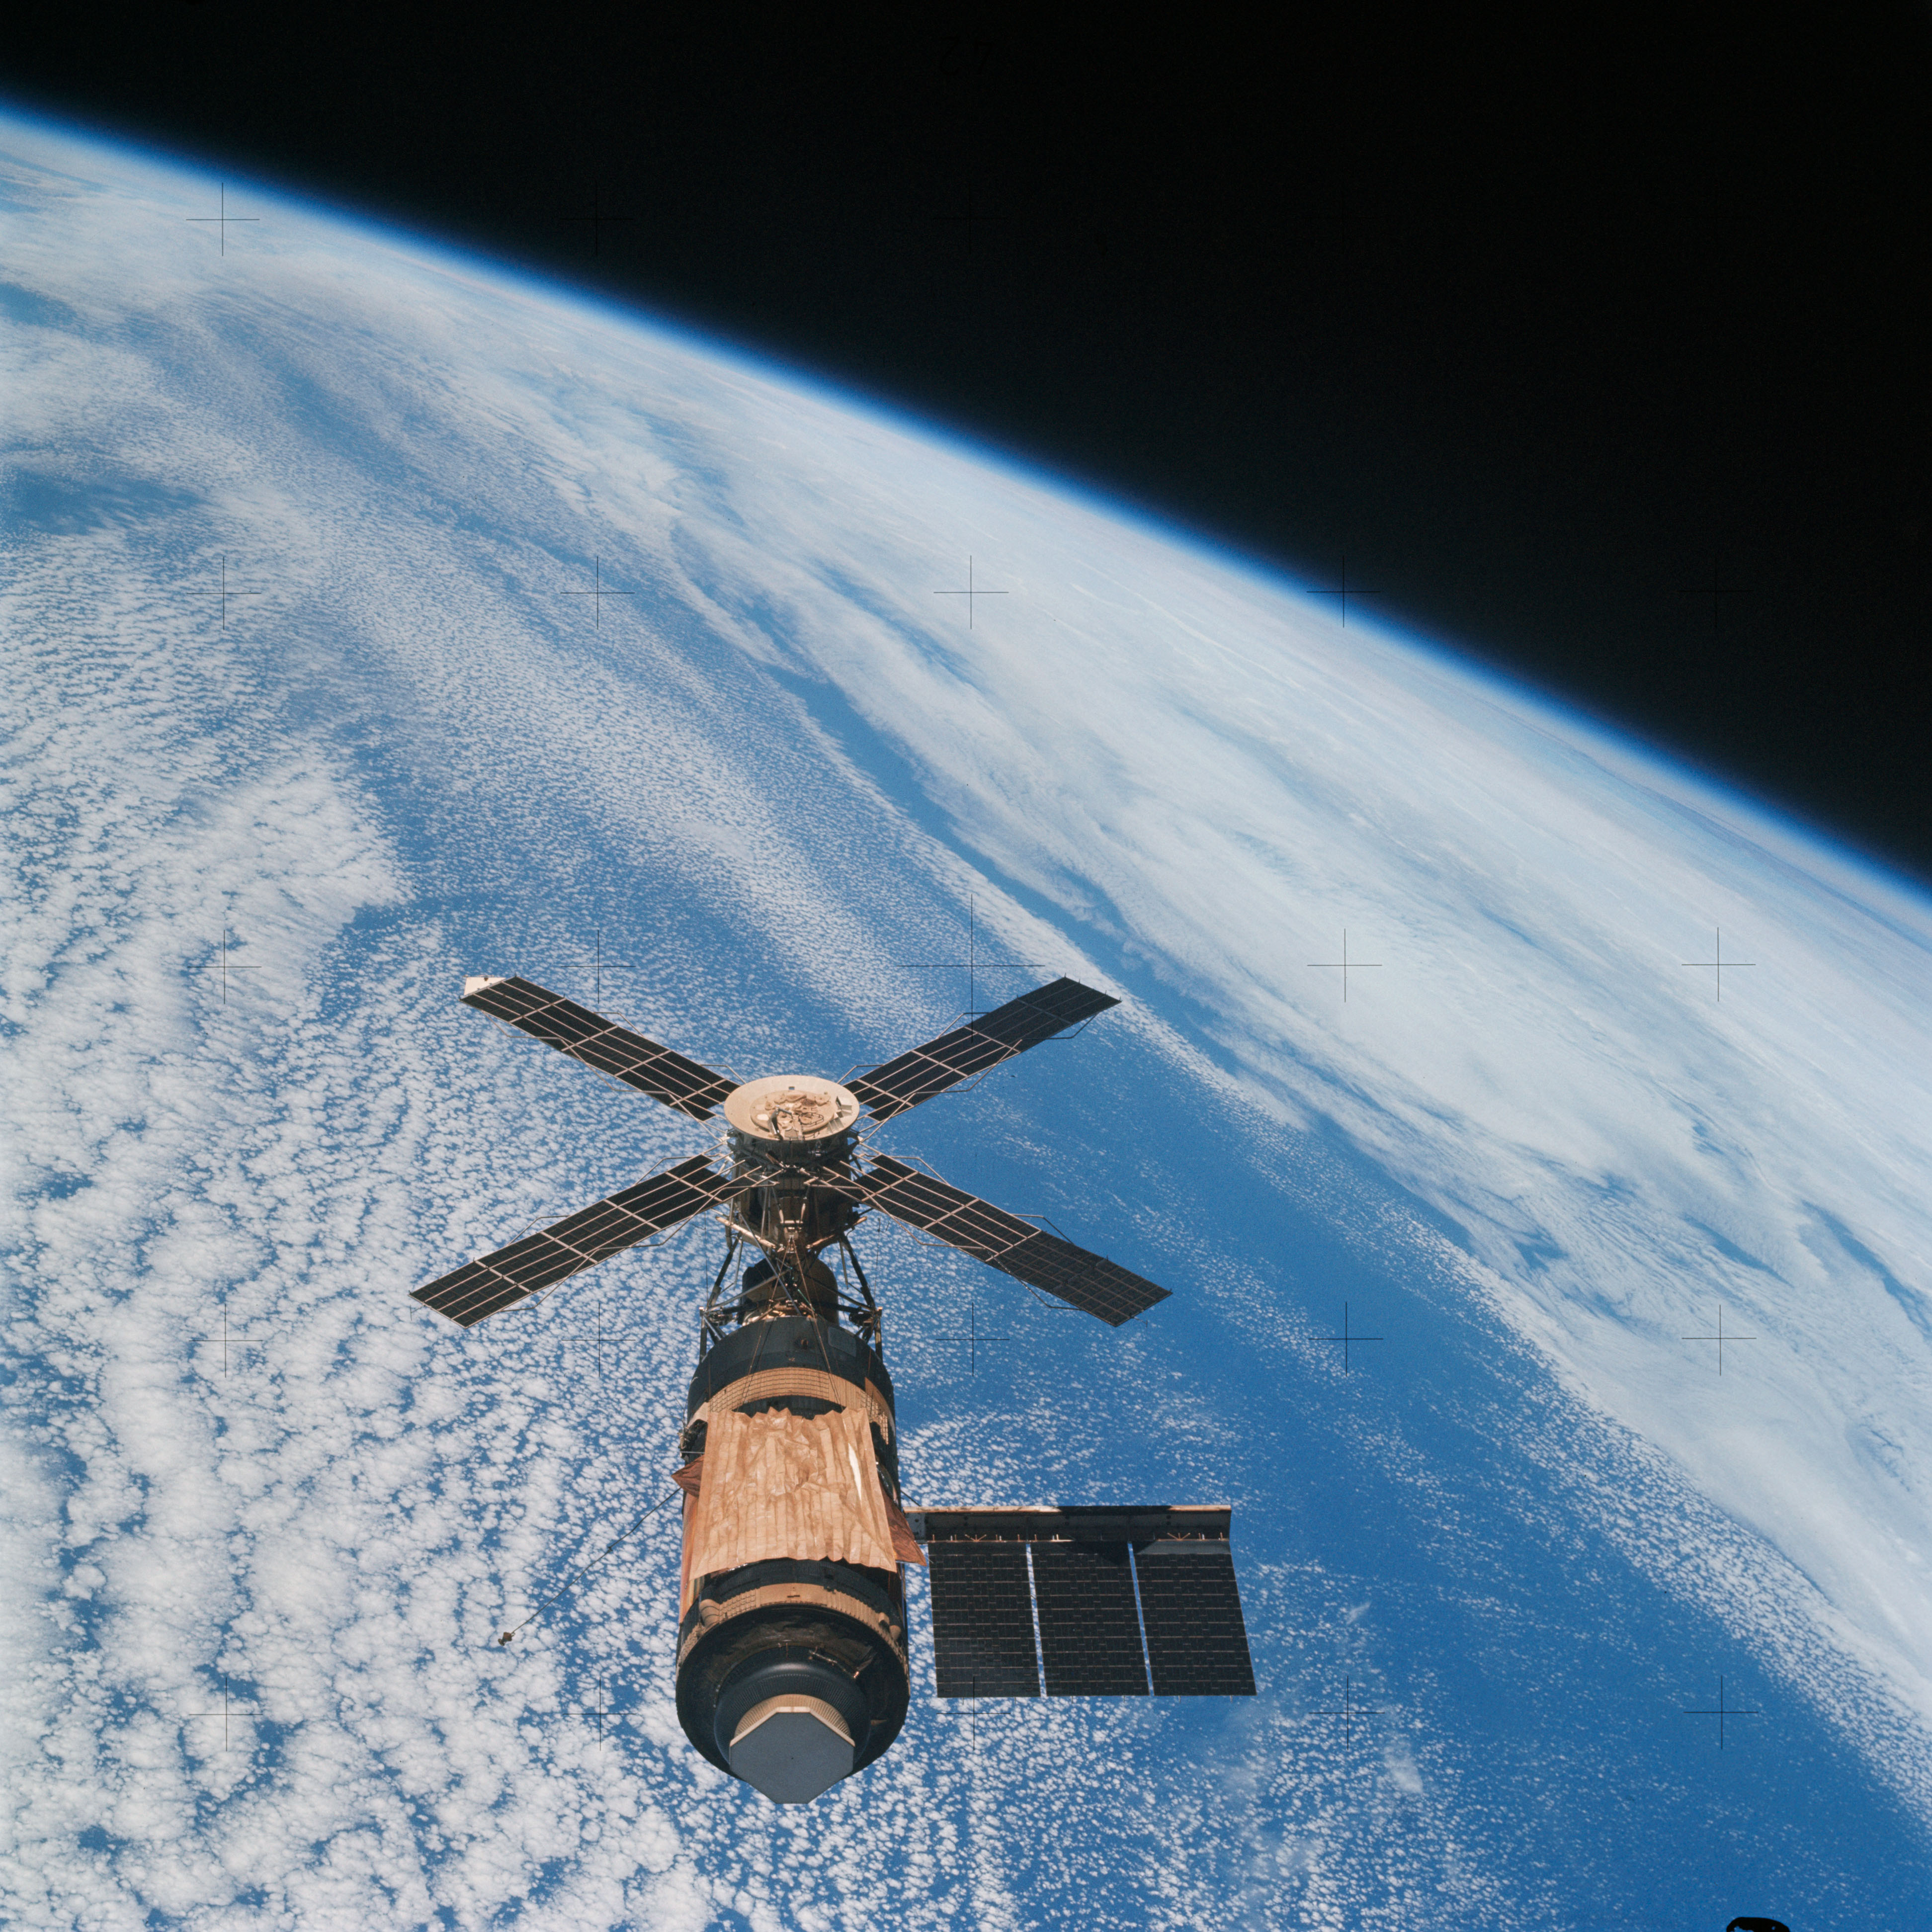 space station nasa - photo #42